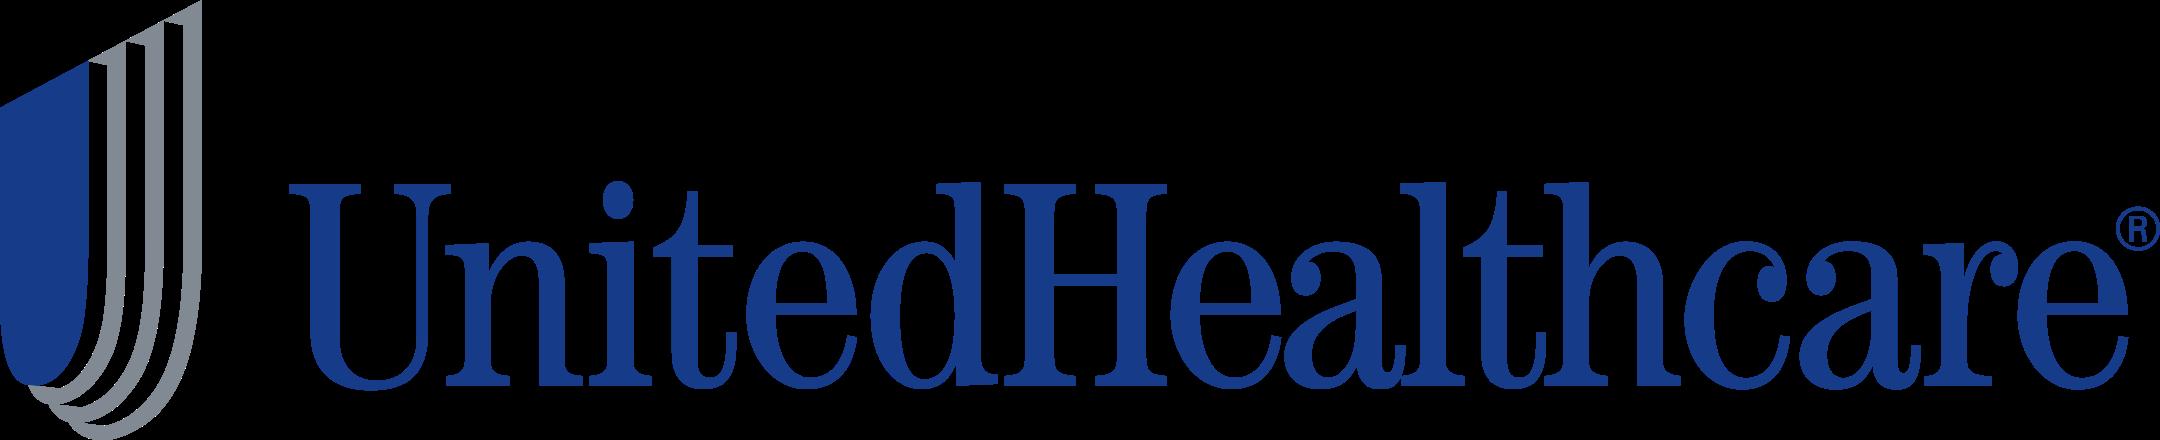 unitedhealthcare logo 1 - UnitedHealthcare Logo